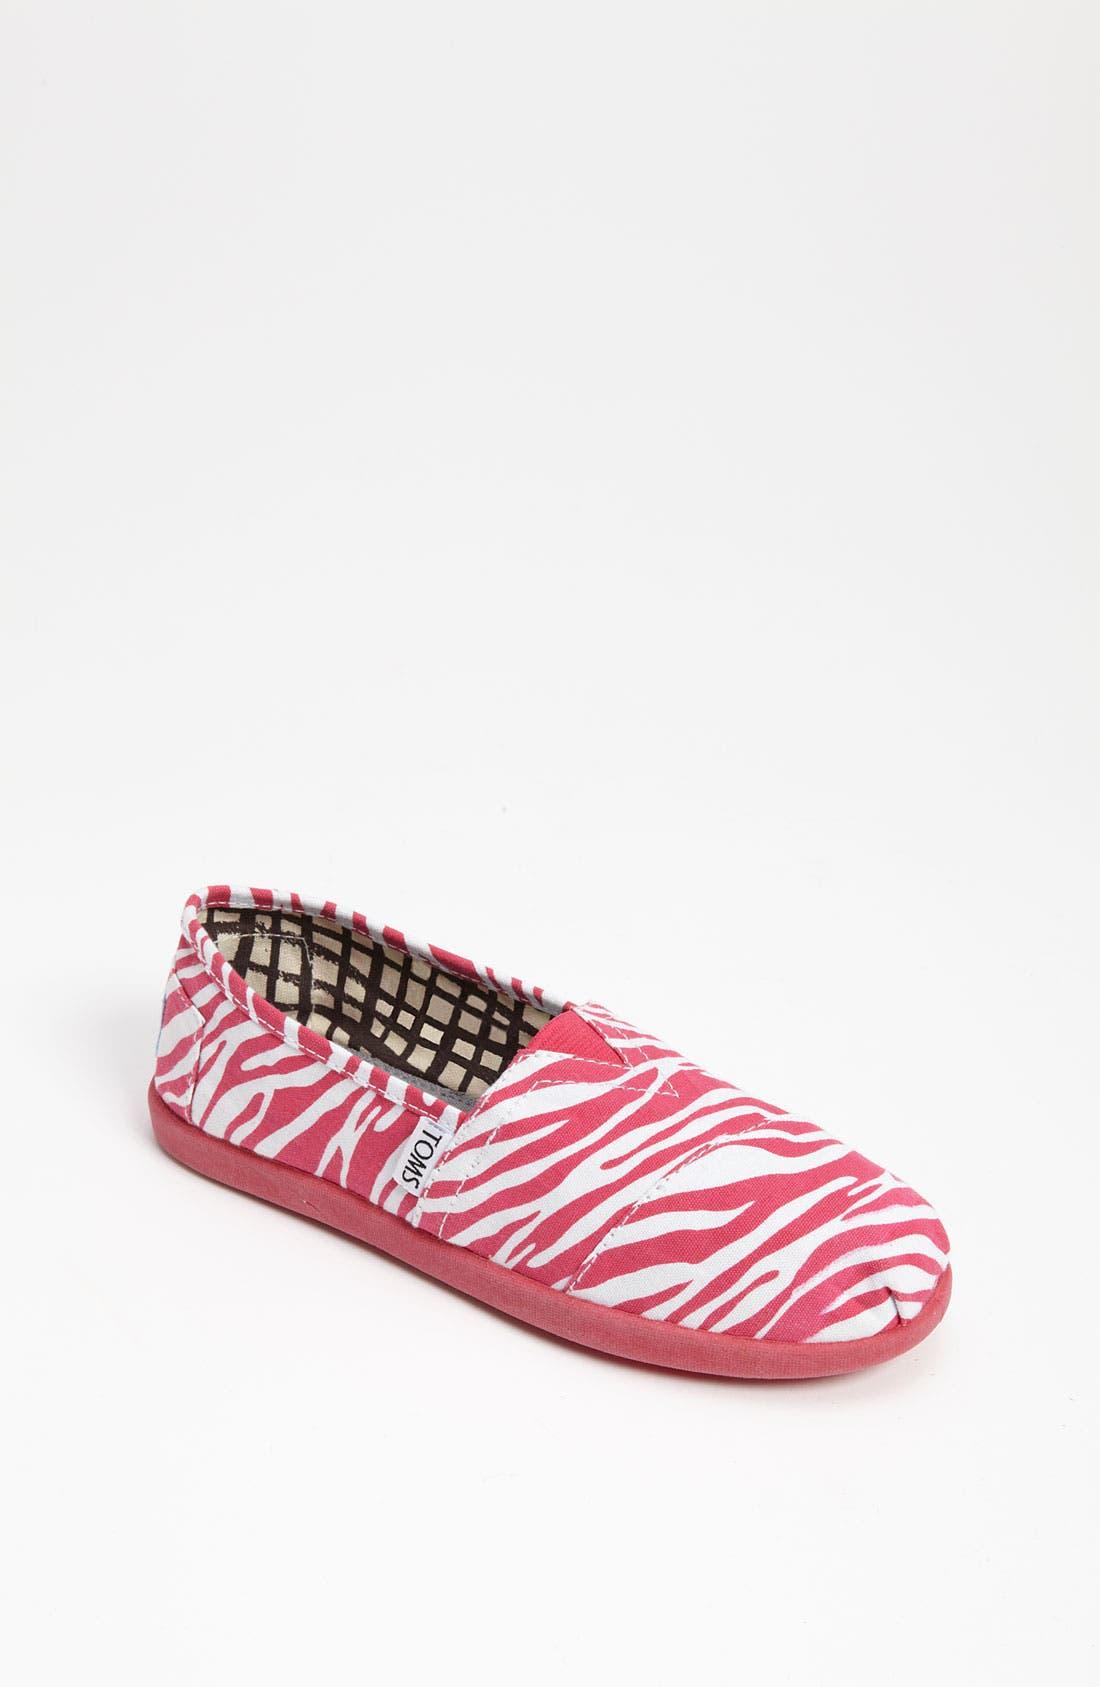 Main Image - TOMS 'Berry Zebra - Youth' Slip-On (Toddler, Little Kid & Big Kid)